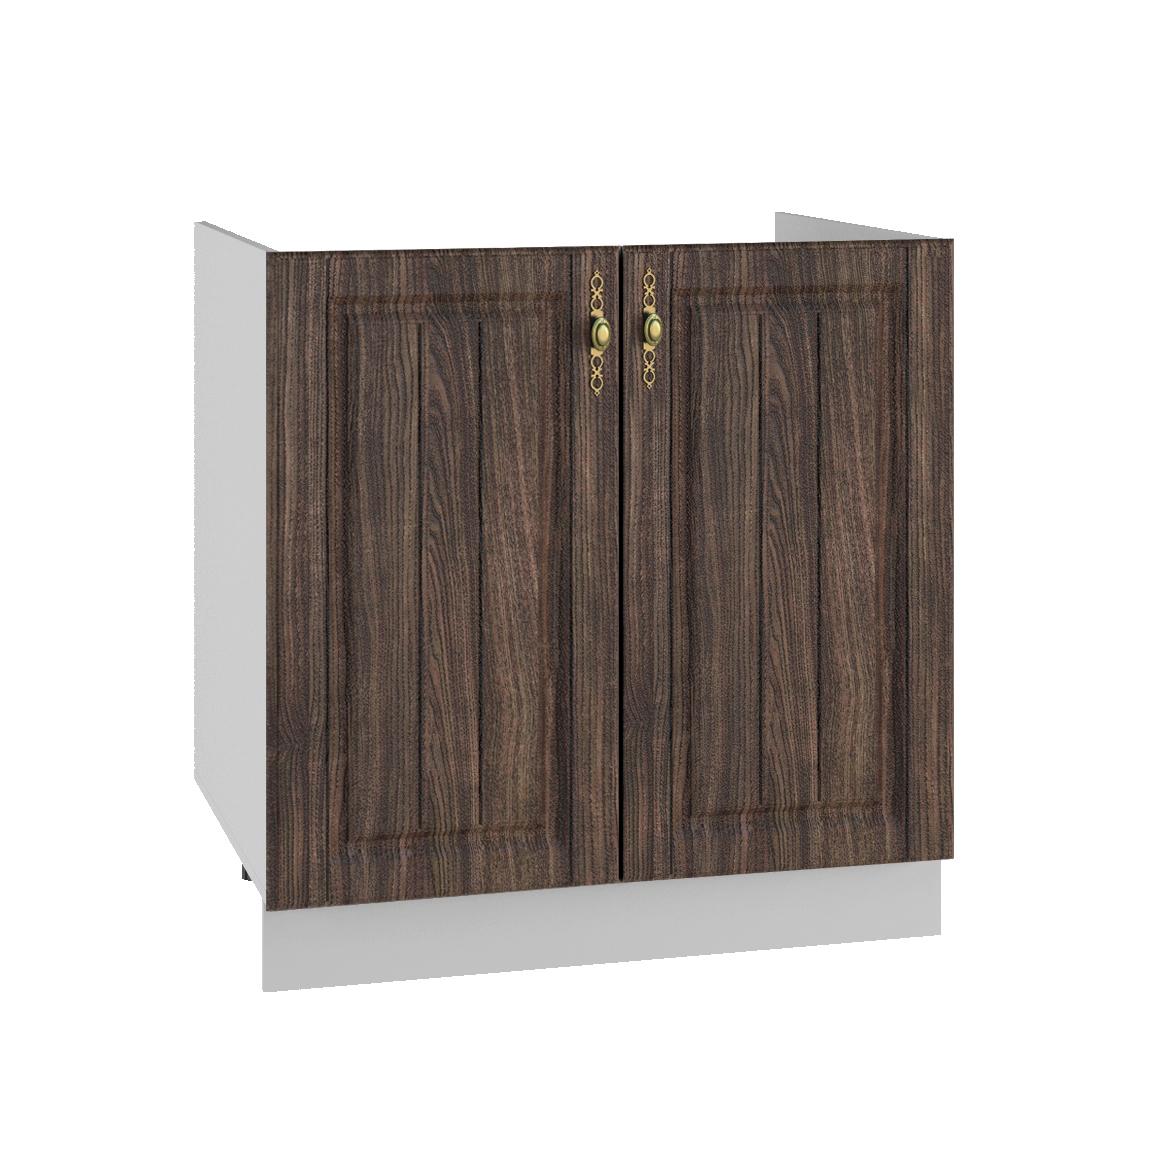 Кухня Империя CМ 800 Шкаф нижний мойка